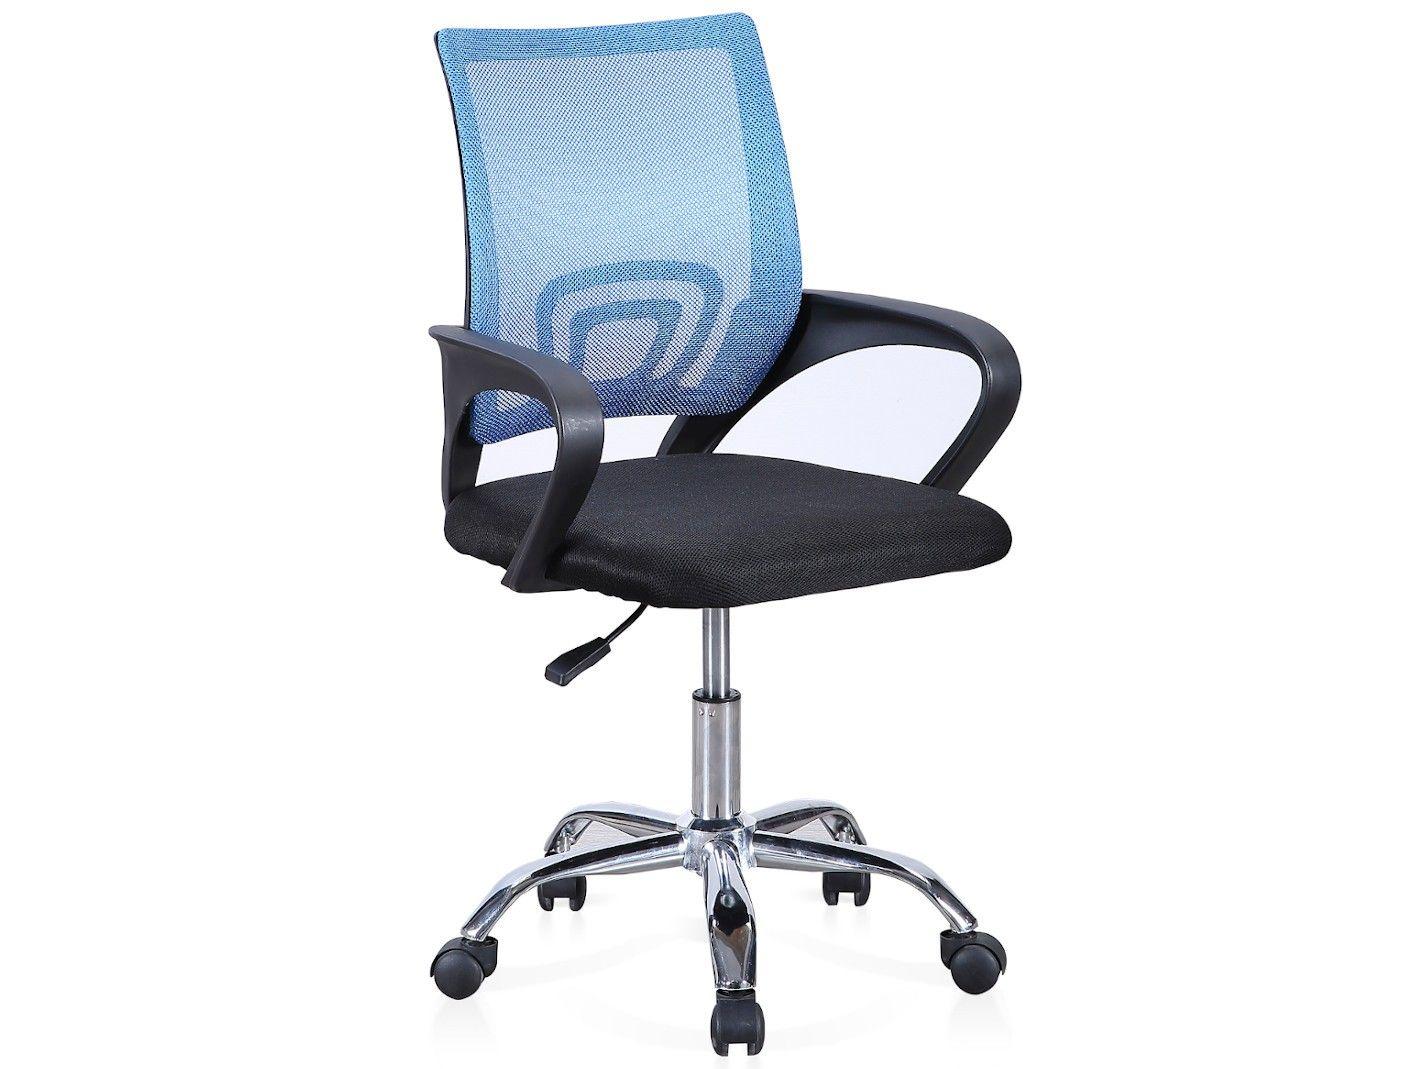 Sof chaise longue modelo palatino - Segunda mano sofa chaise longue ...